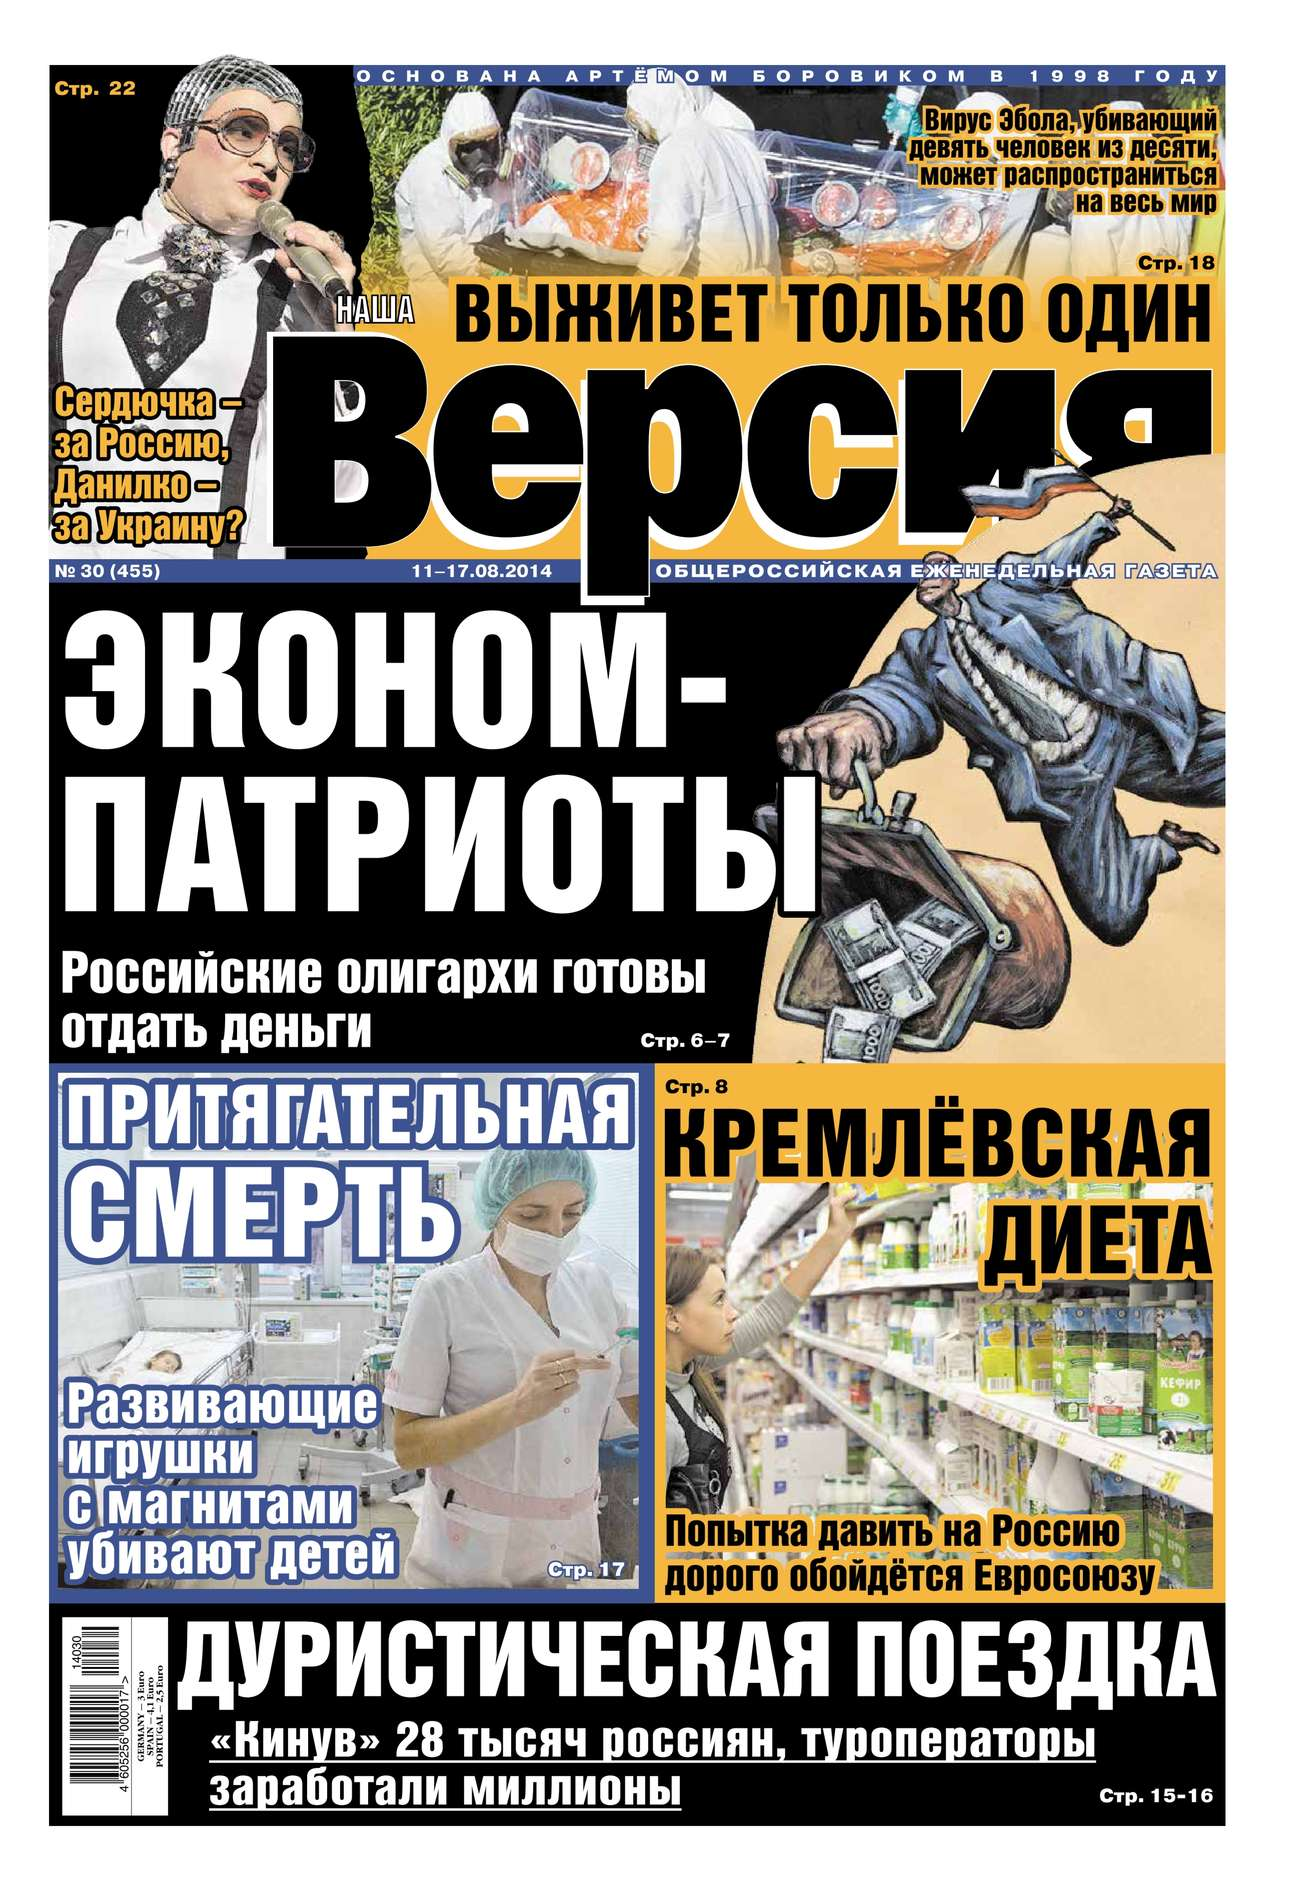 Редакция газеты Наша Версия Наша версия 30-2014 цена и фото